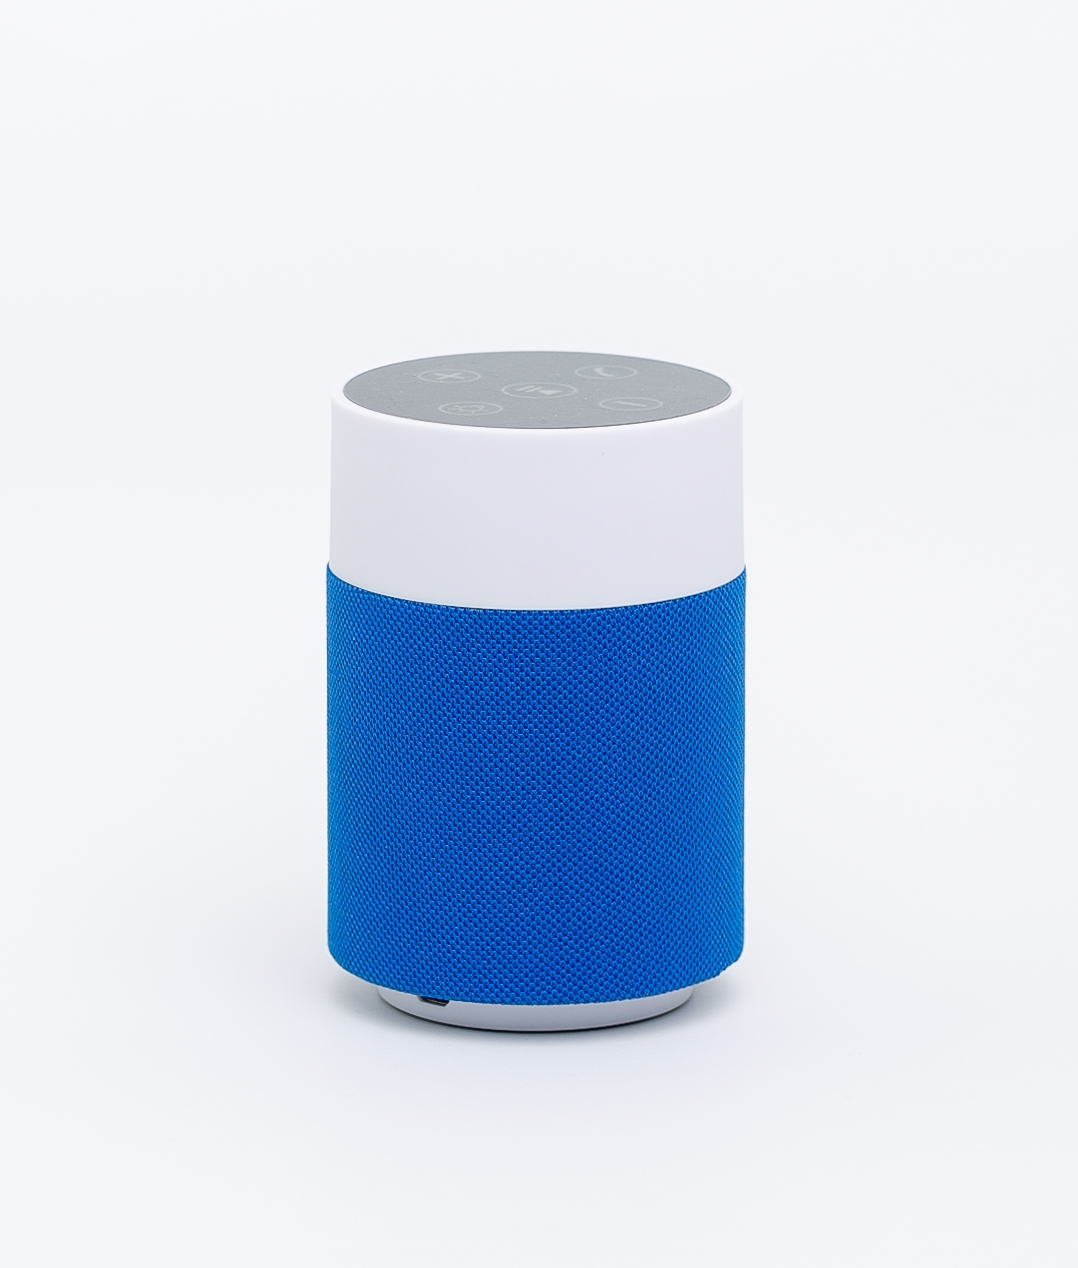 Altoparlante Bluetooth Abacus - Blu